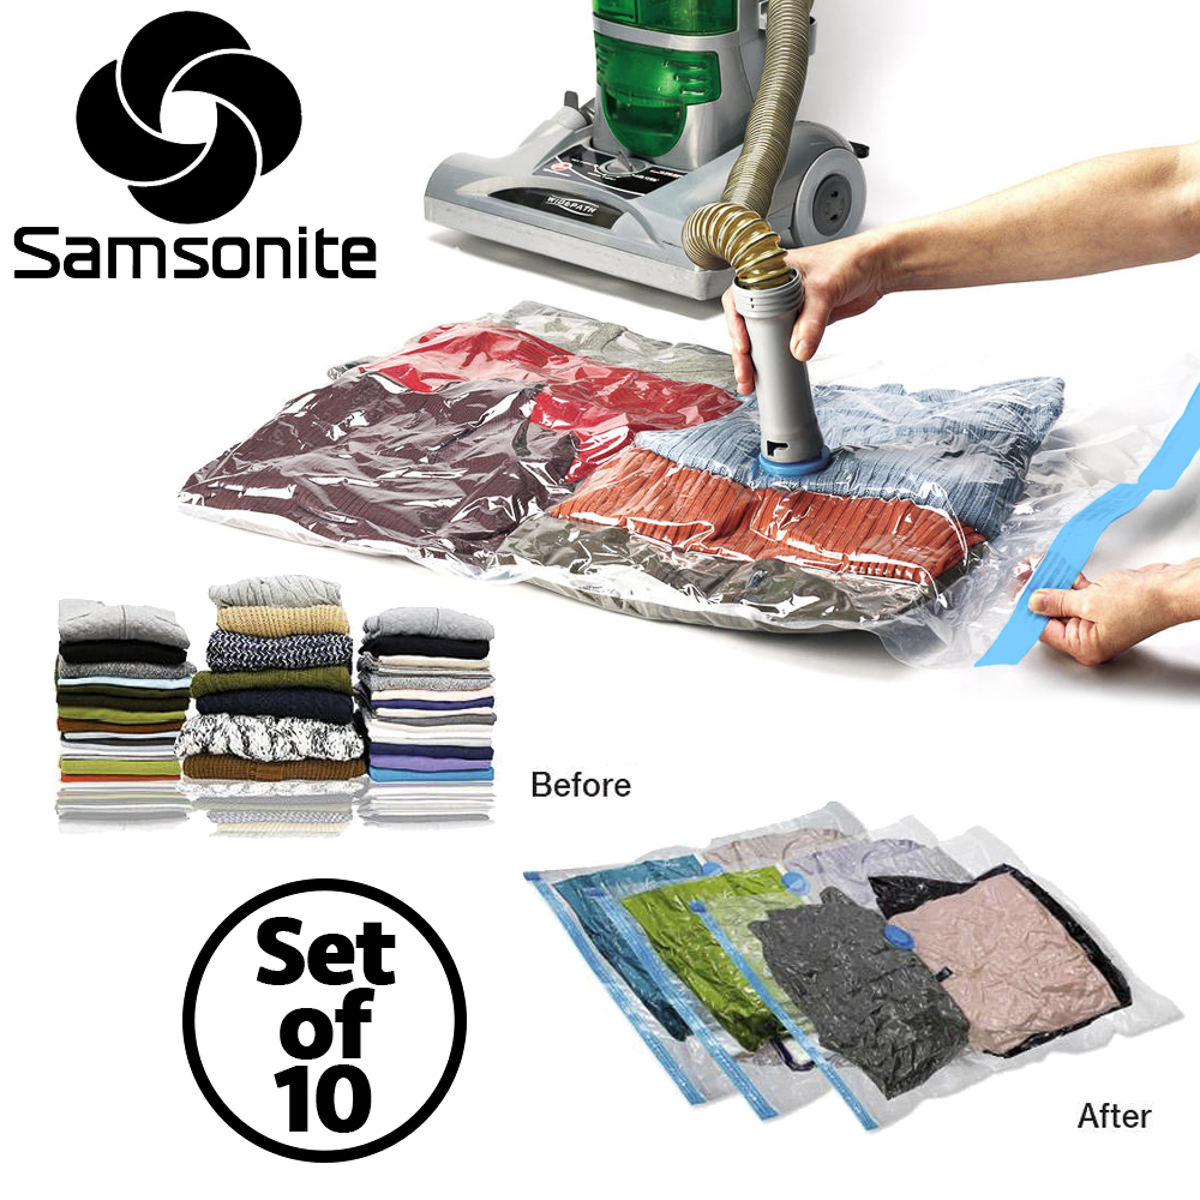 10pc Samsonite Vacuum Storage Bags Set Compress Protect Organize Clothes Bedding